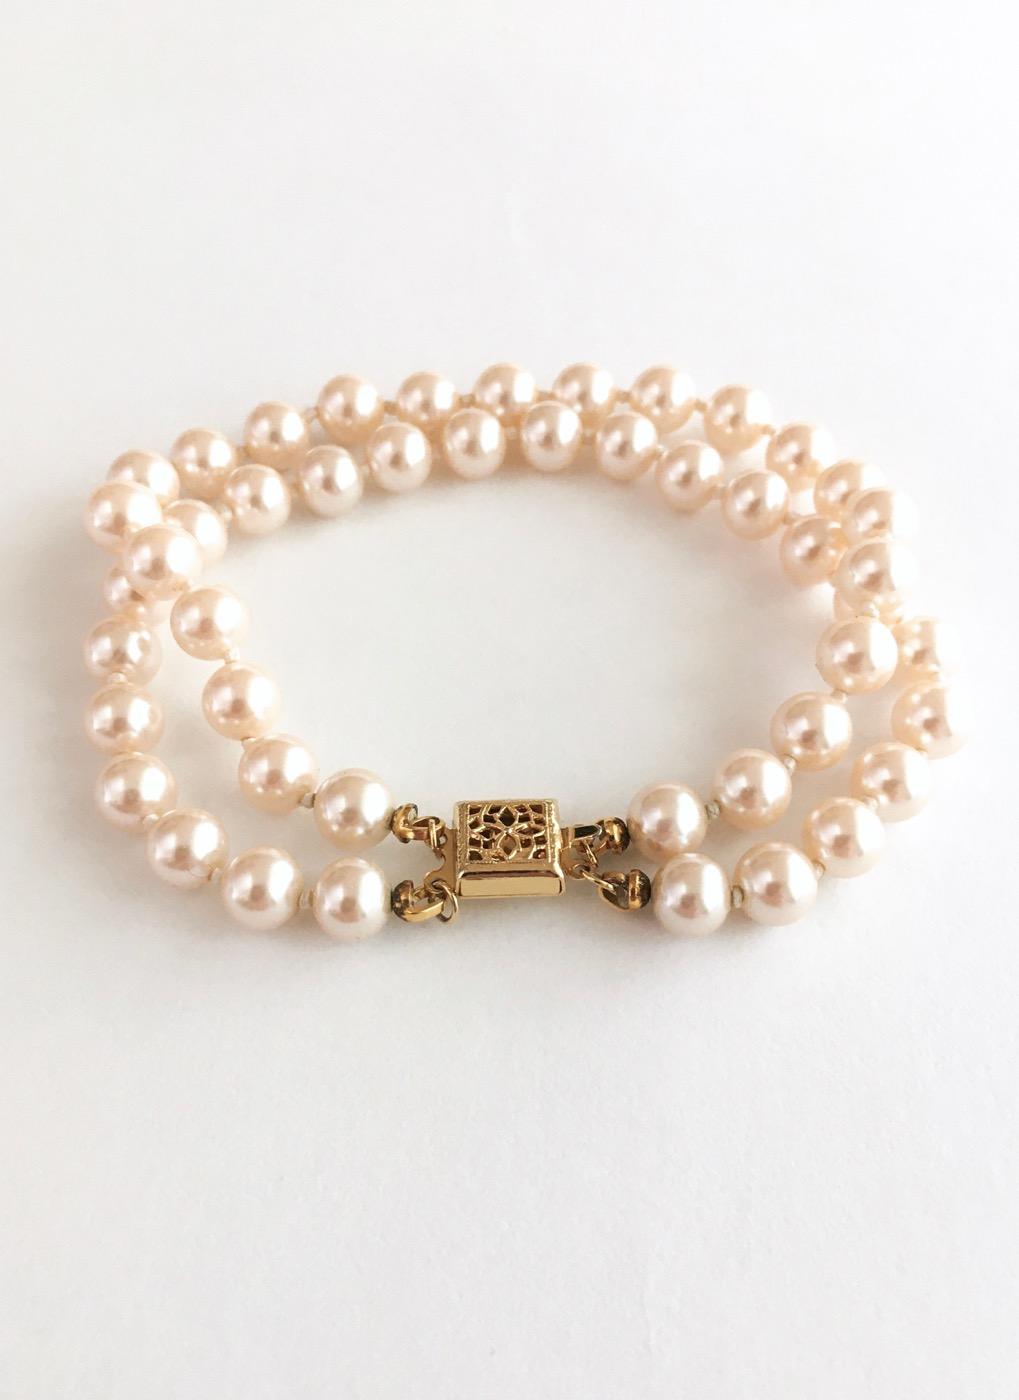 vintage-1950s-glass-faux-pearl-double-strand-bracelet - 1